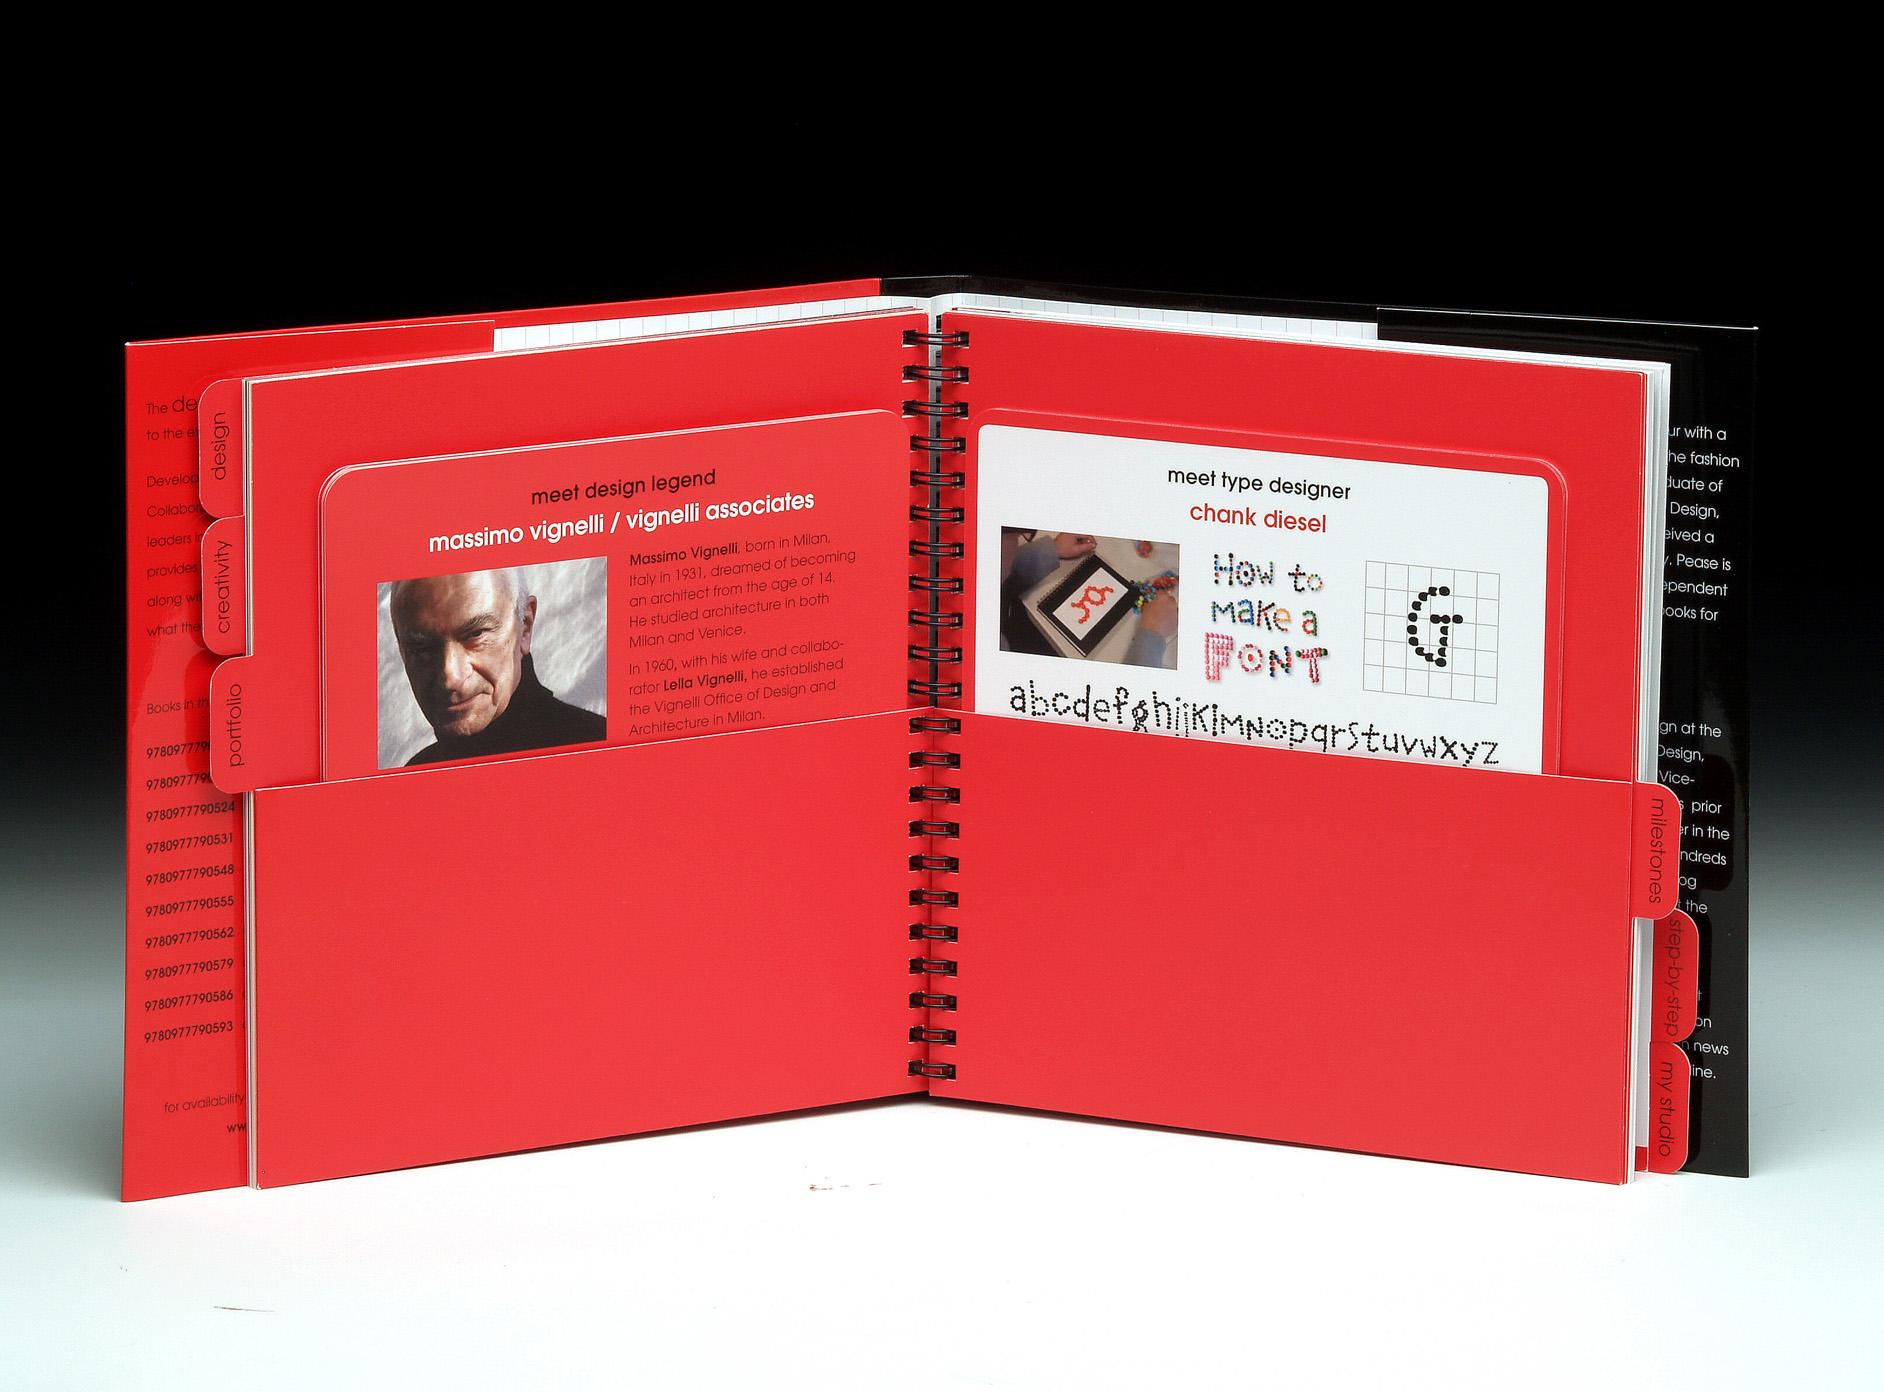 books graphic designer portfolio nonfiction artful jazz enfant